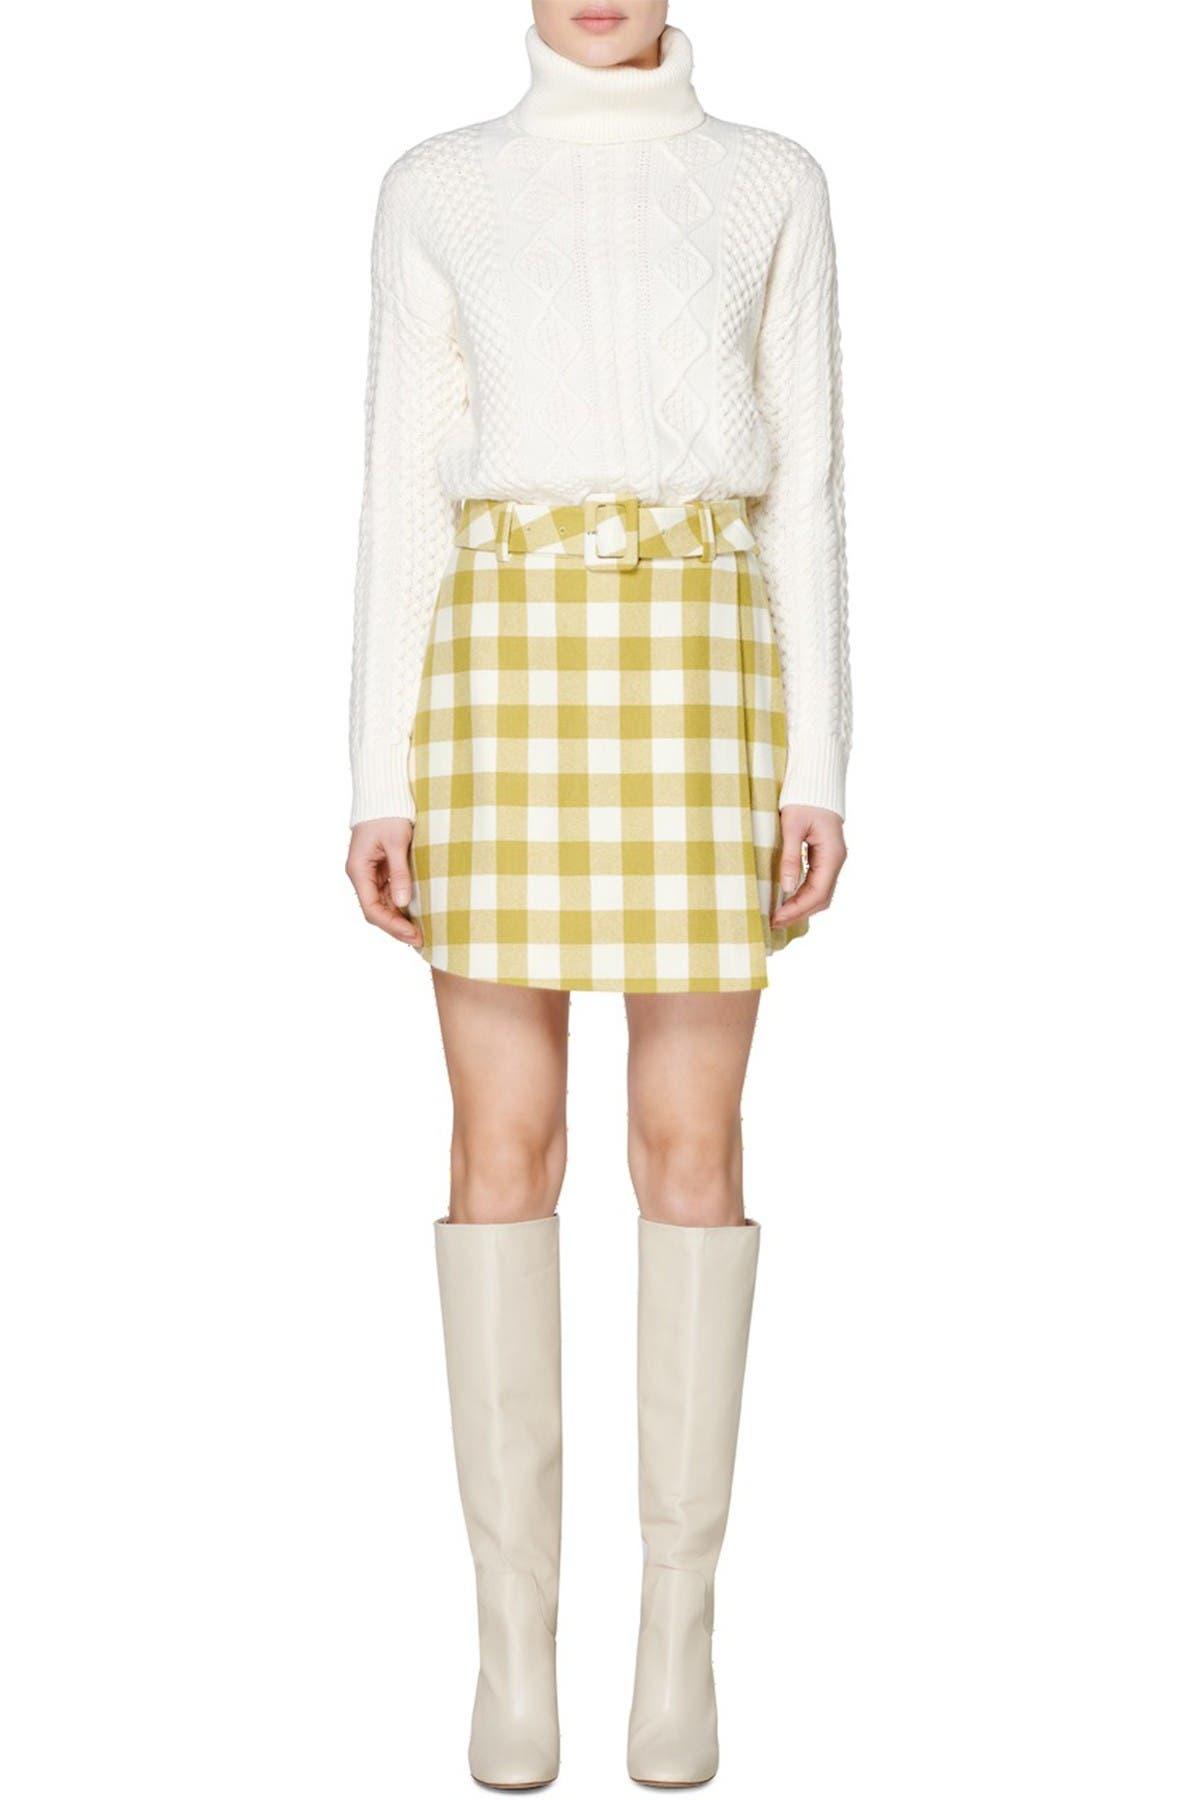 Image of SUISTUDIO Calvin Check Print Skirt